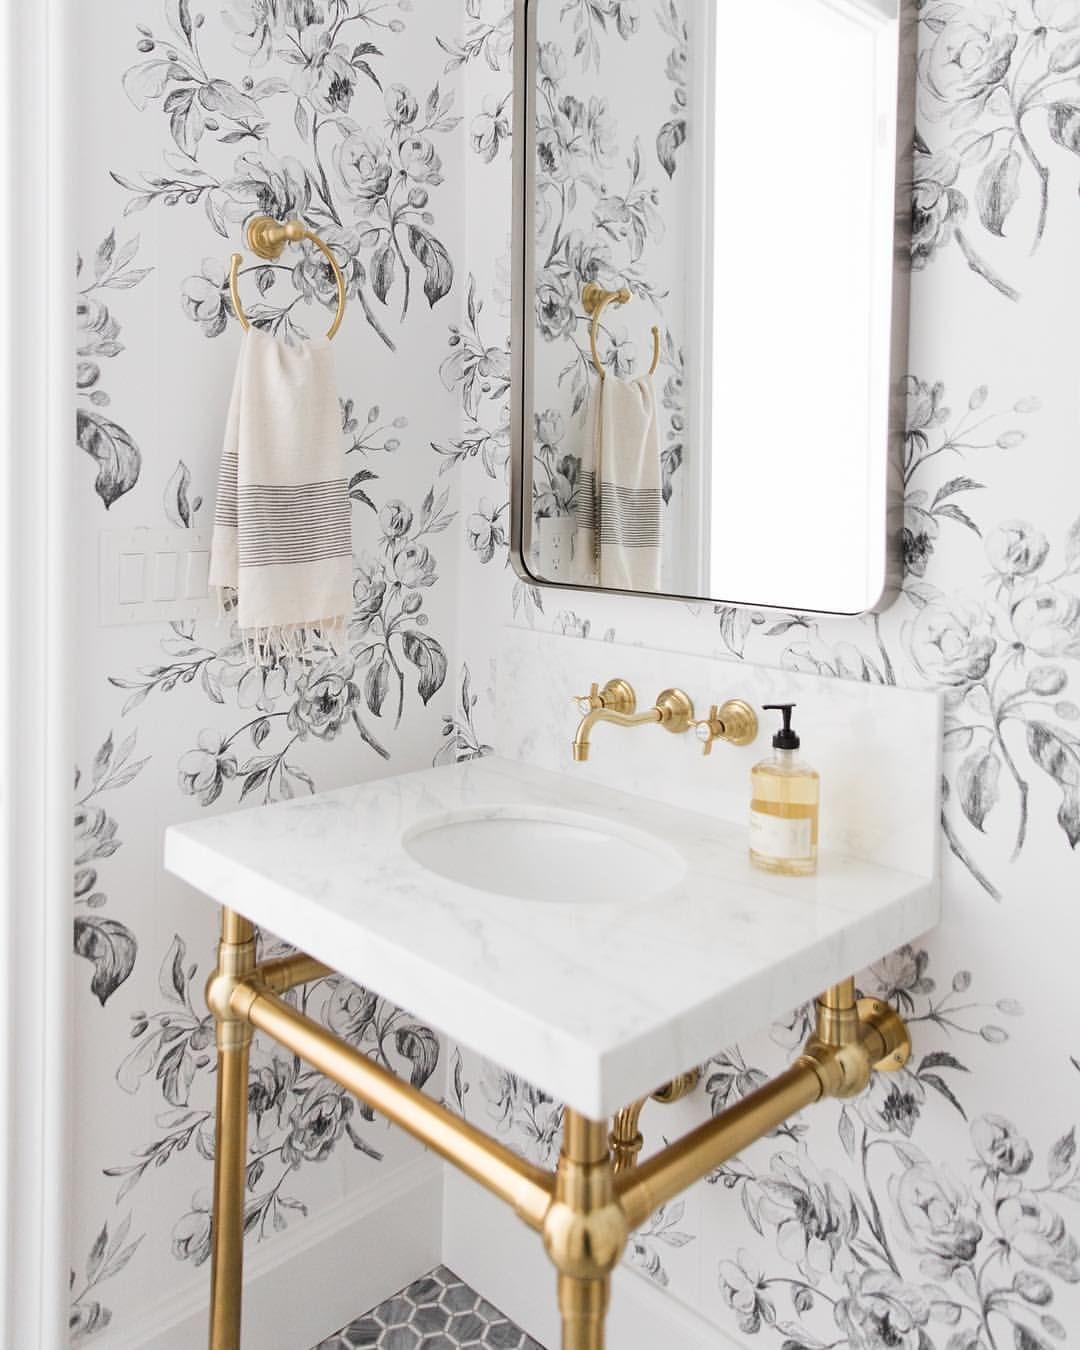 Farmhouse Bathroom Inspiration | Gold Apothecary Sink | Black White Flower Wallpaper Bathroom | Floral Wallpapered Bathroom Ideas